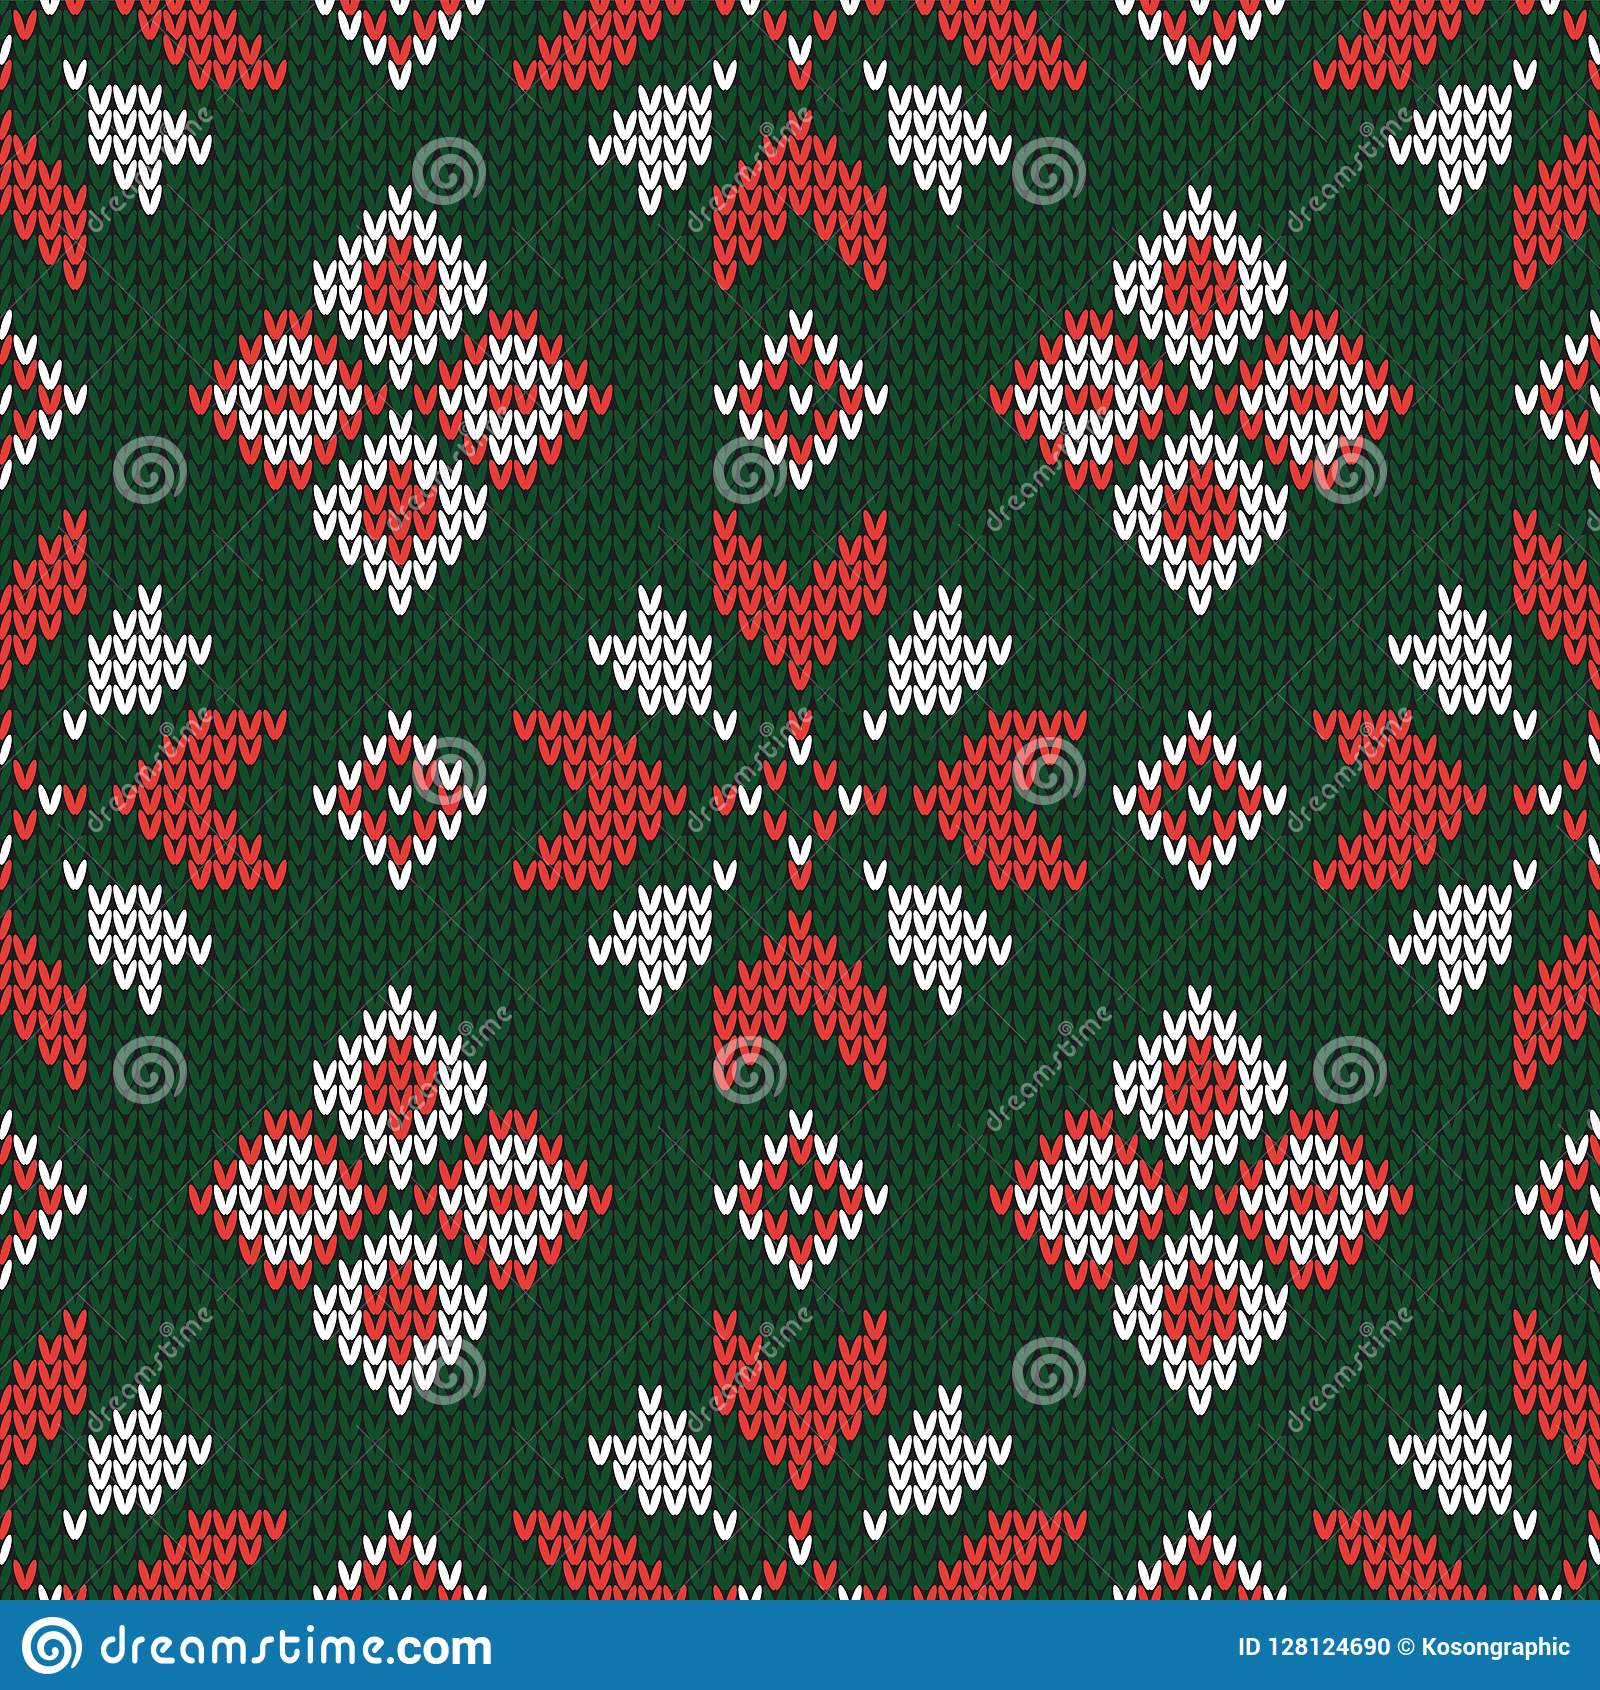 Christmas Knitted Pattern Geometric Abstract Seamless Pattern